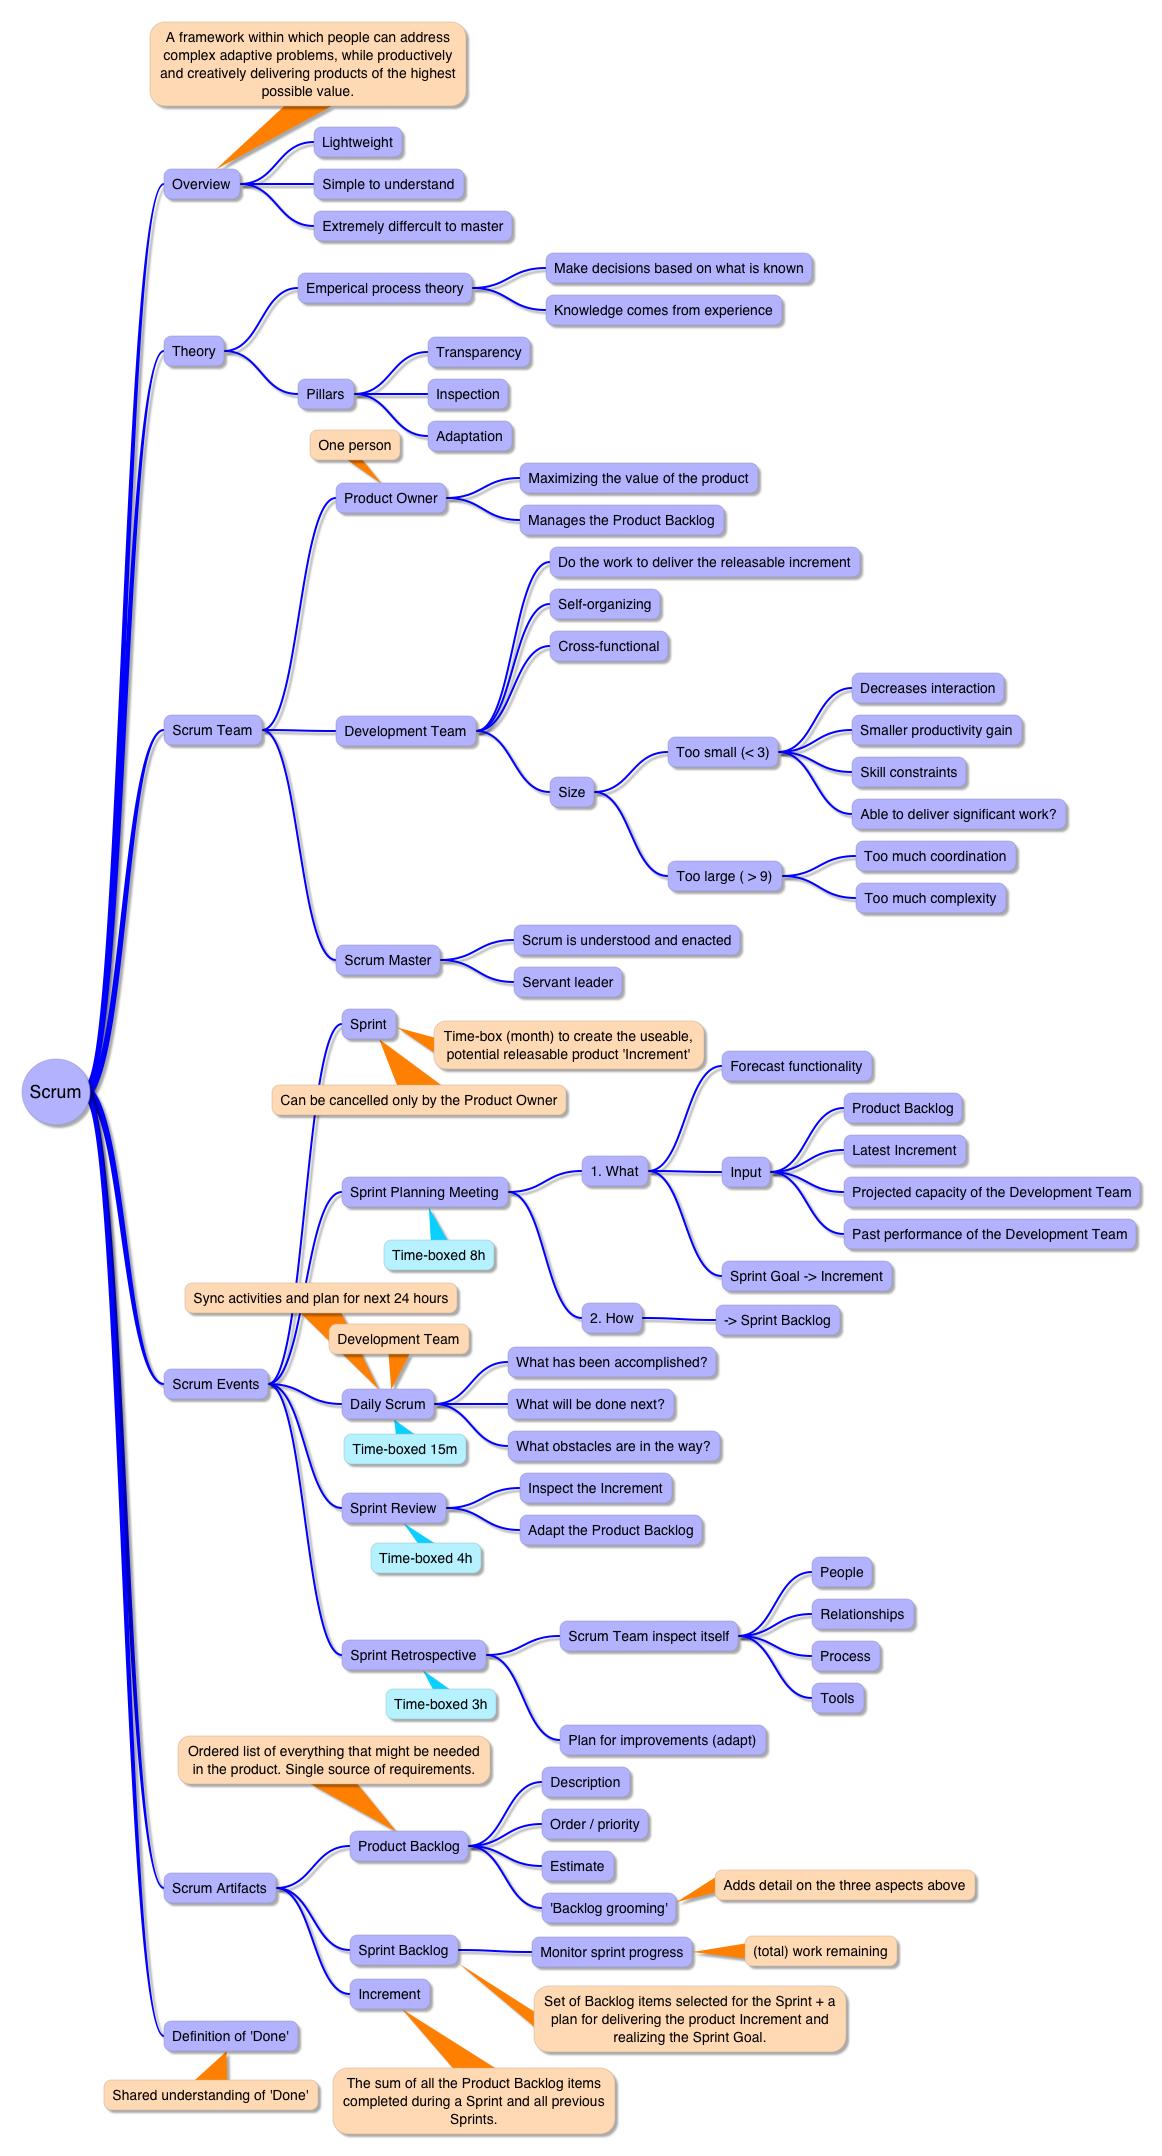 Scrum guide mind map | business | Pinterest | Project management ...